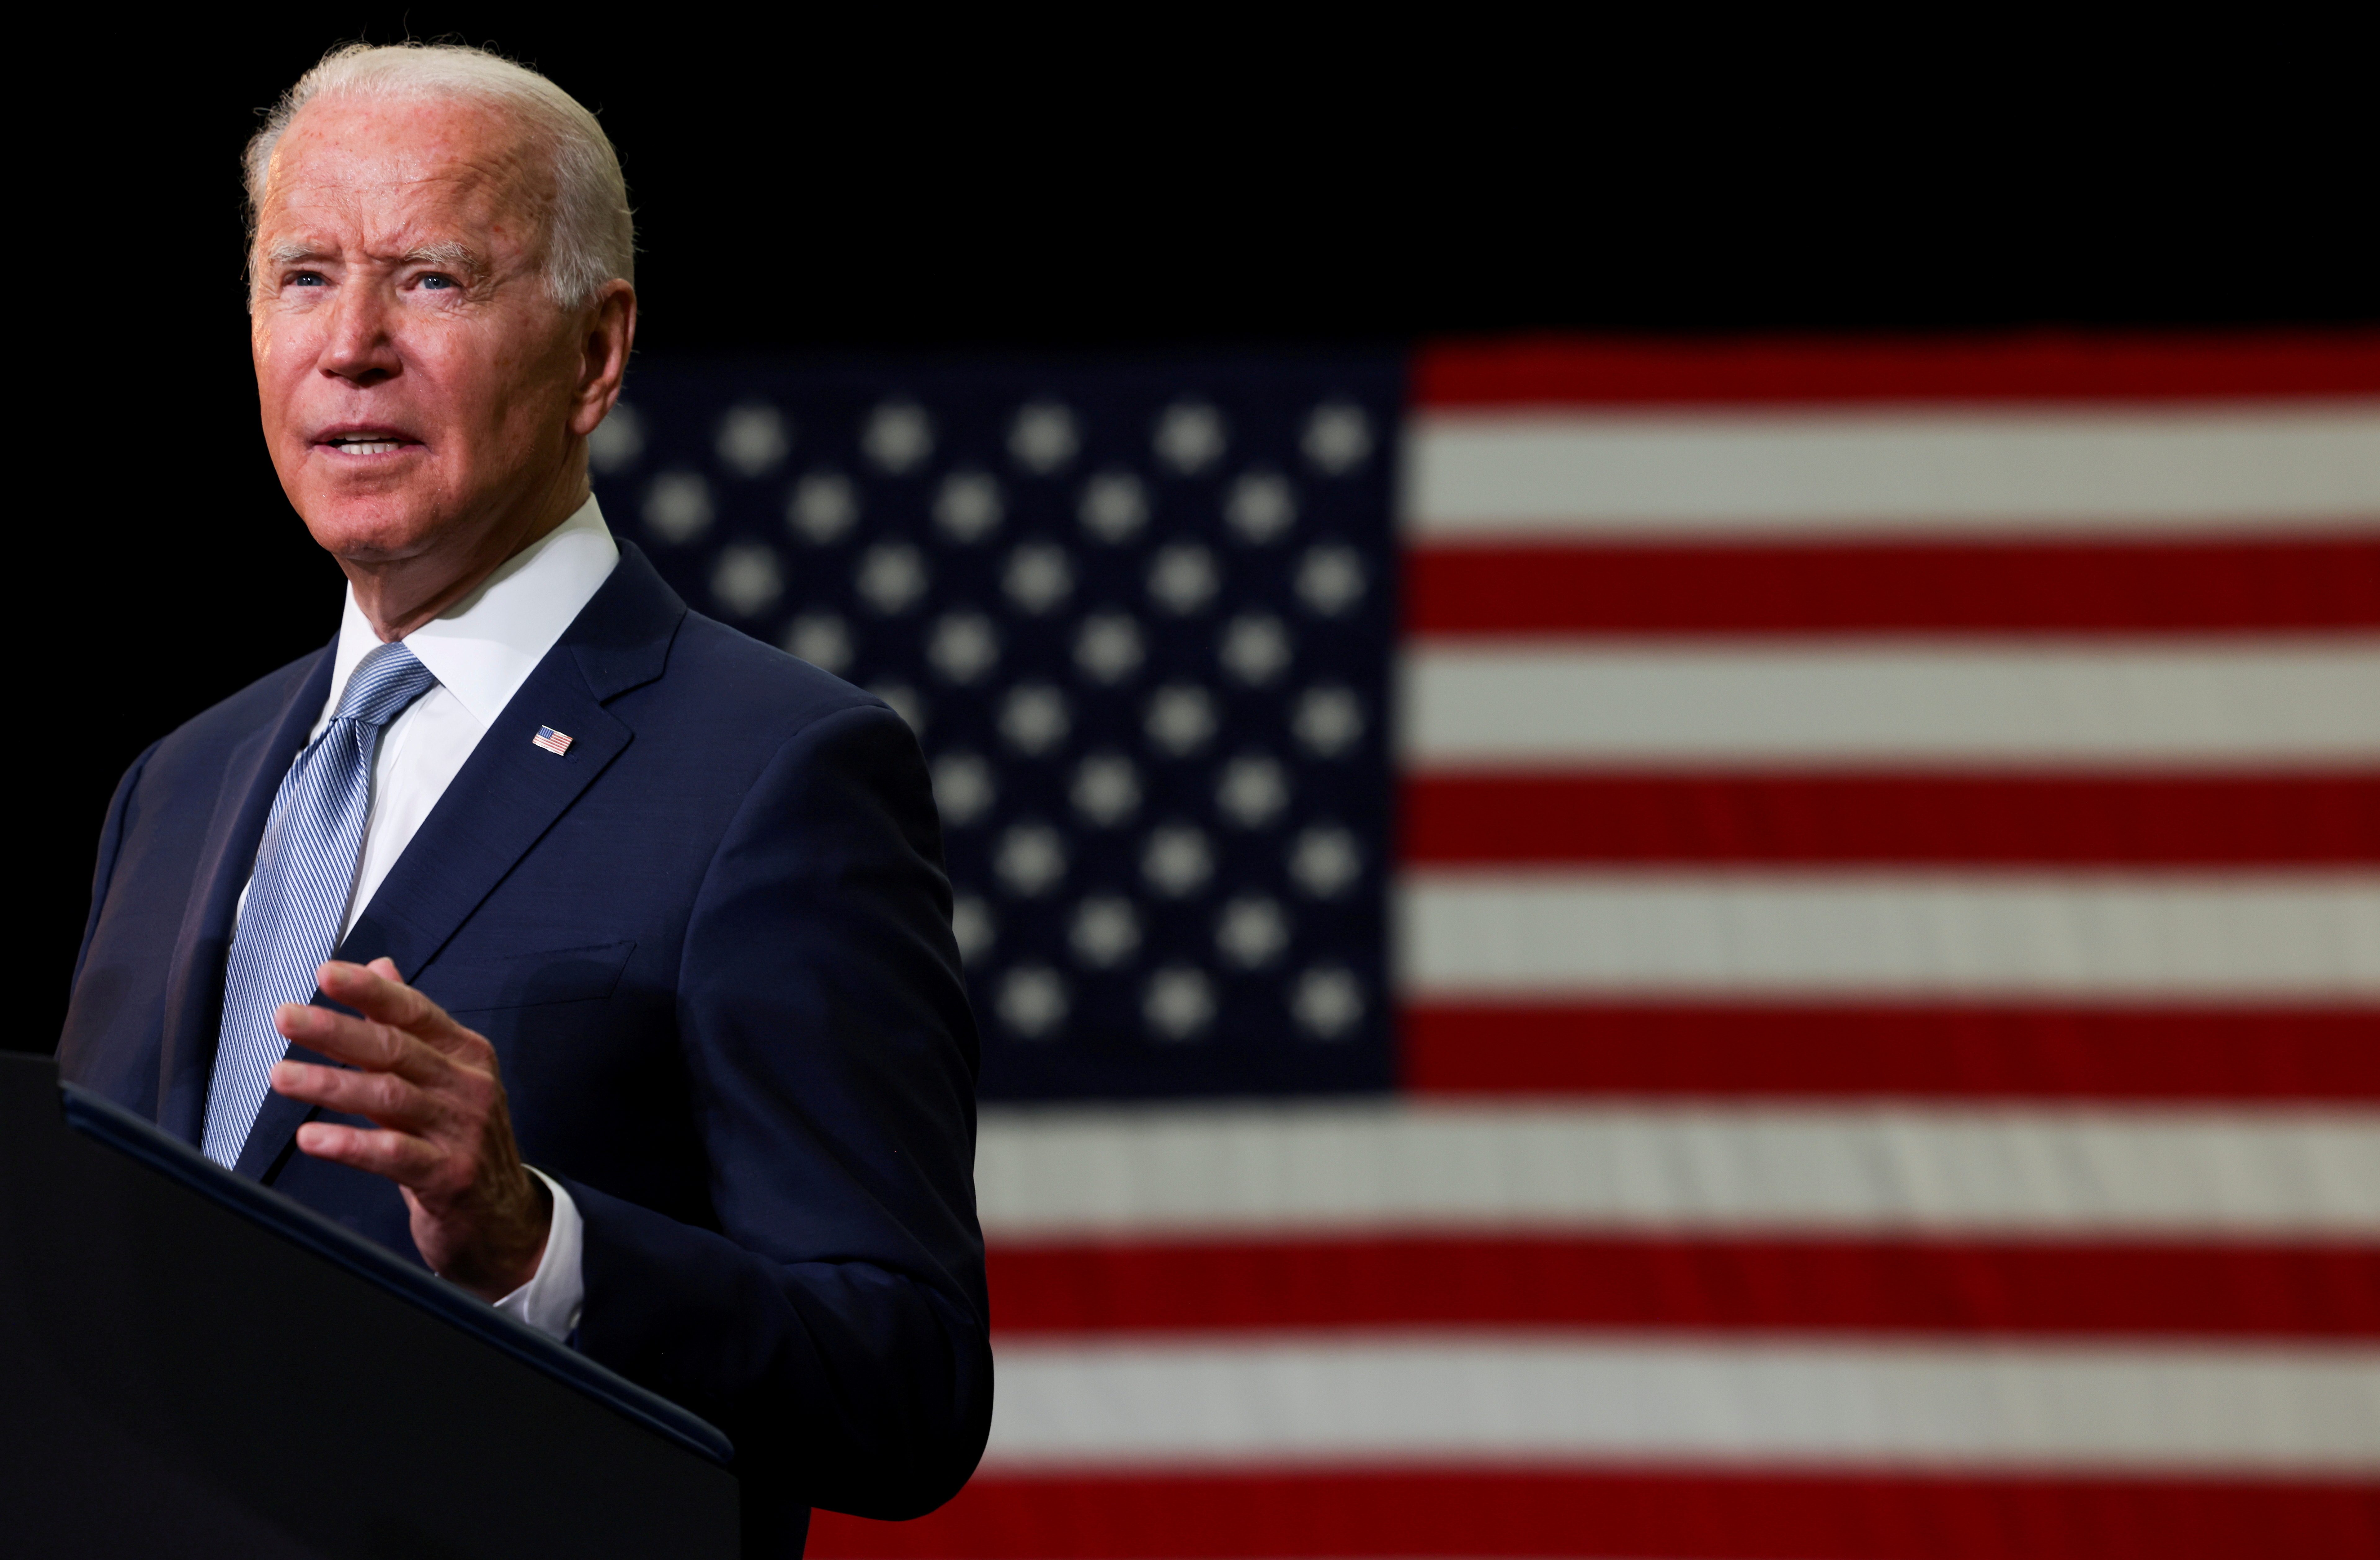 U.S. President Joe Biden delivers remarks on his proposed